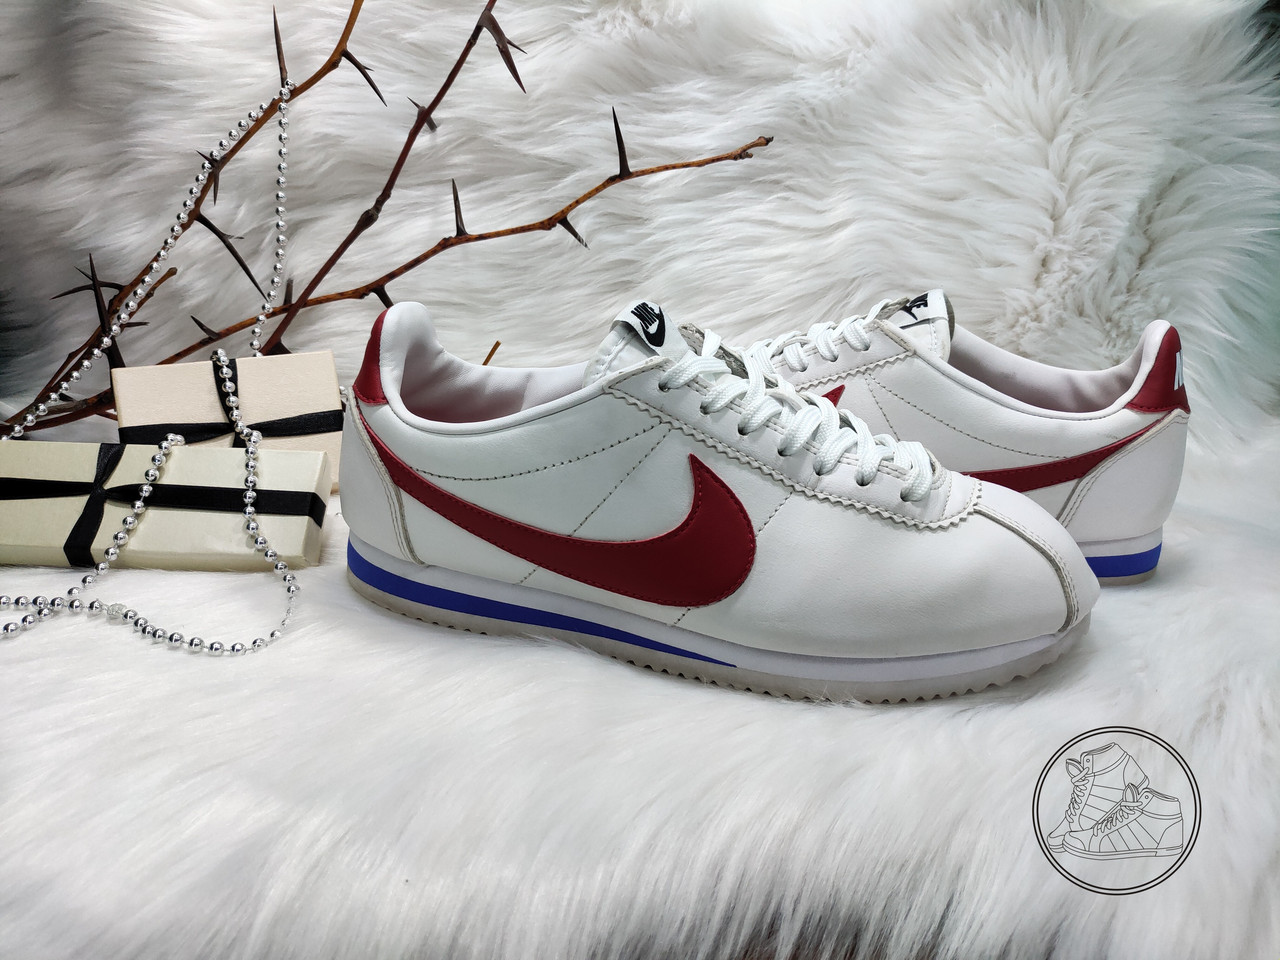 99a634bb Кроссовки Nike Classic Cortez Leather (38 размер) бу: кроссовки от ...